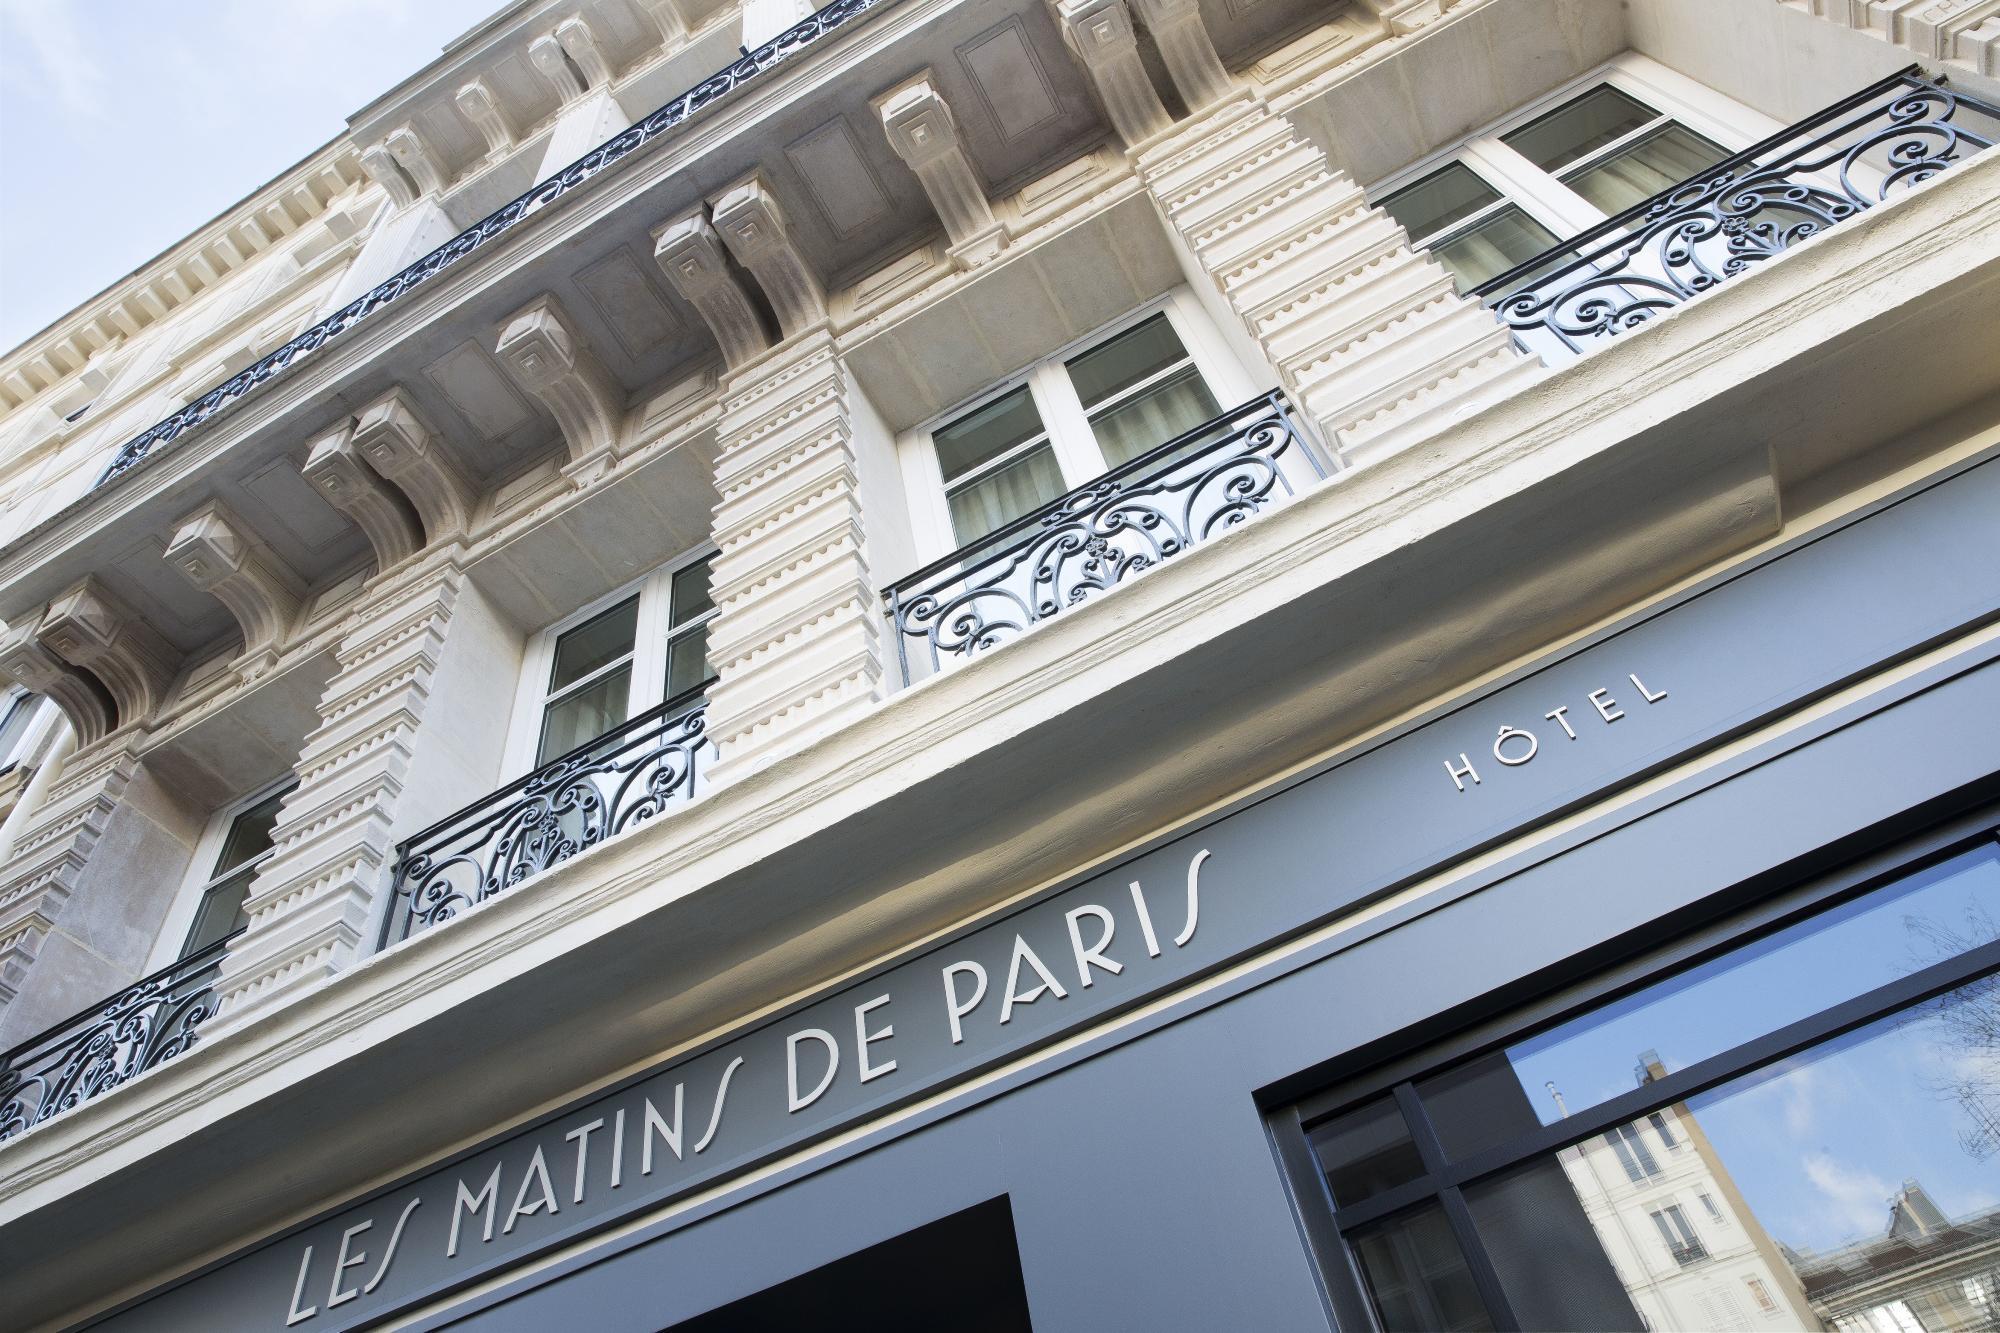 Hotel Les Matins de Paris Facade